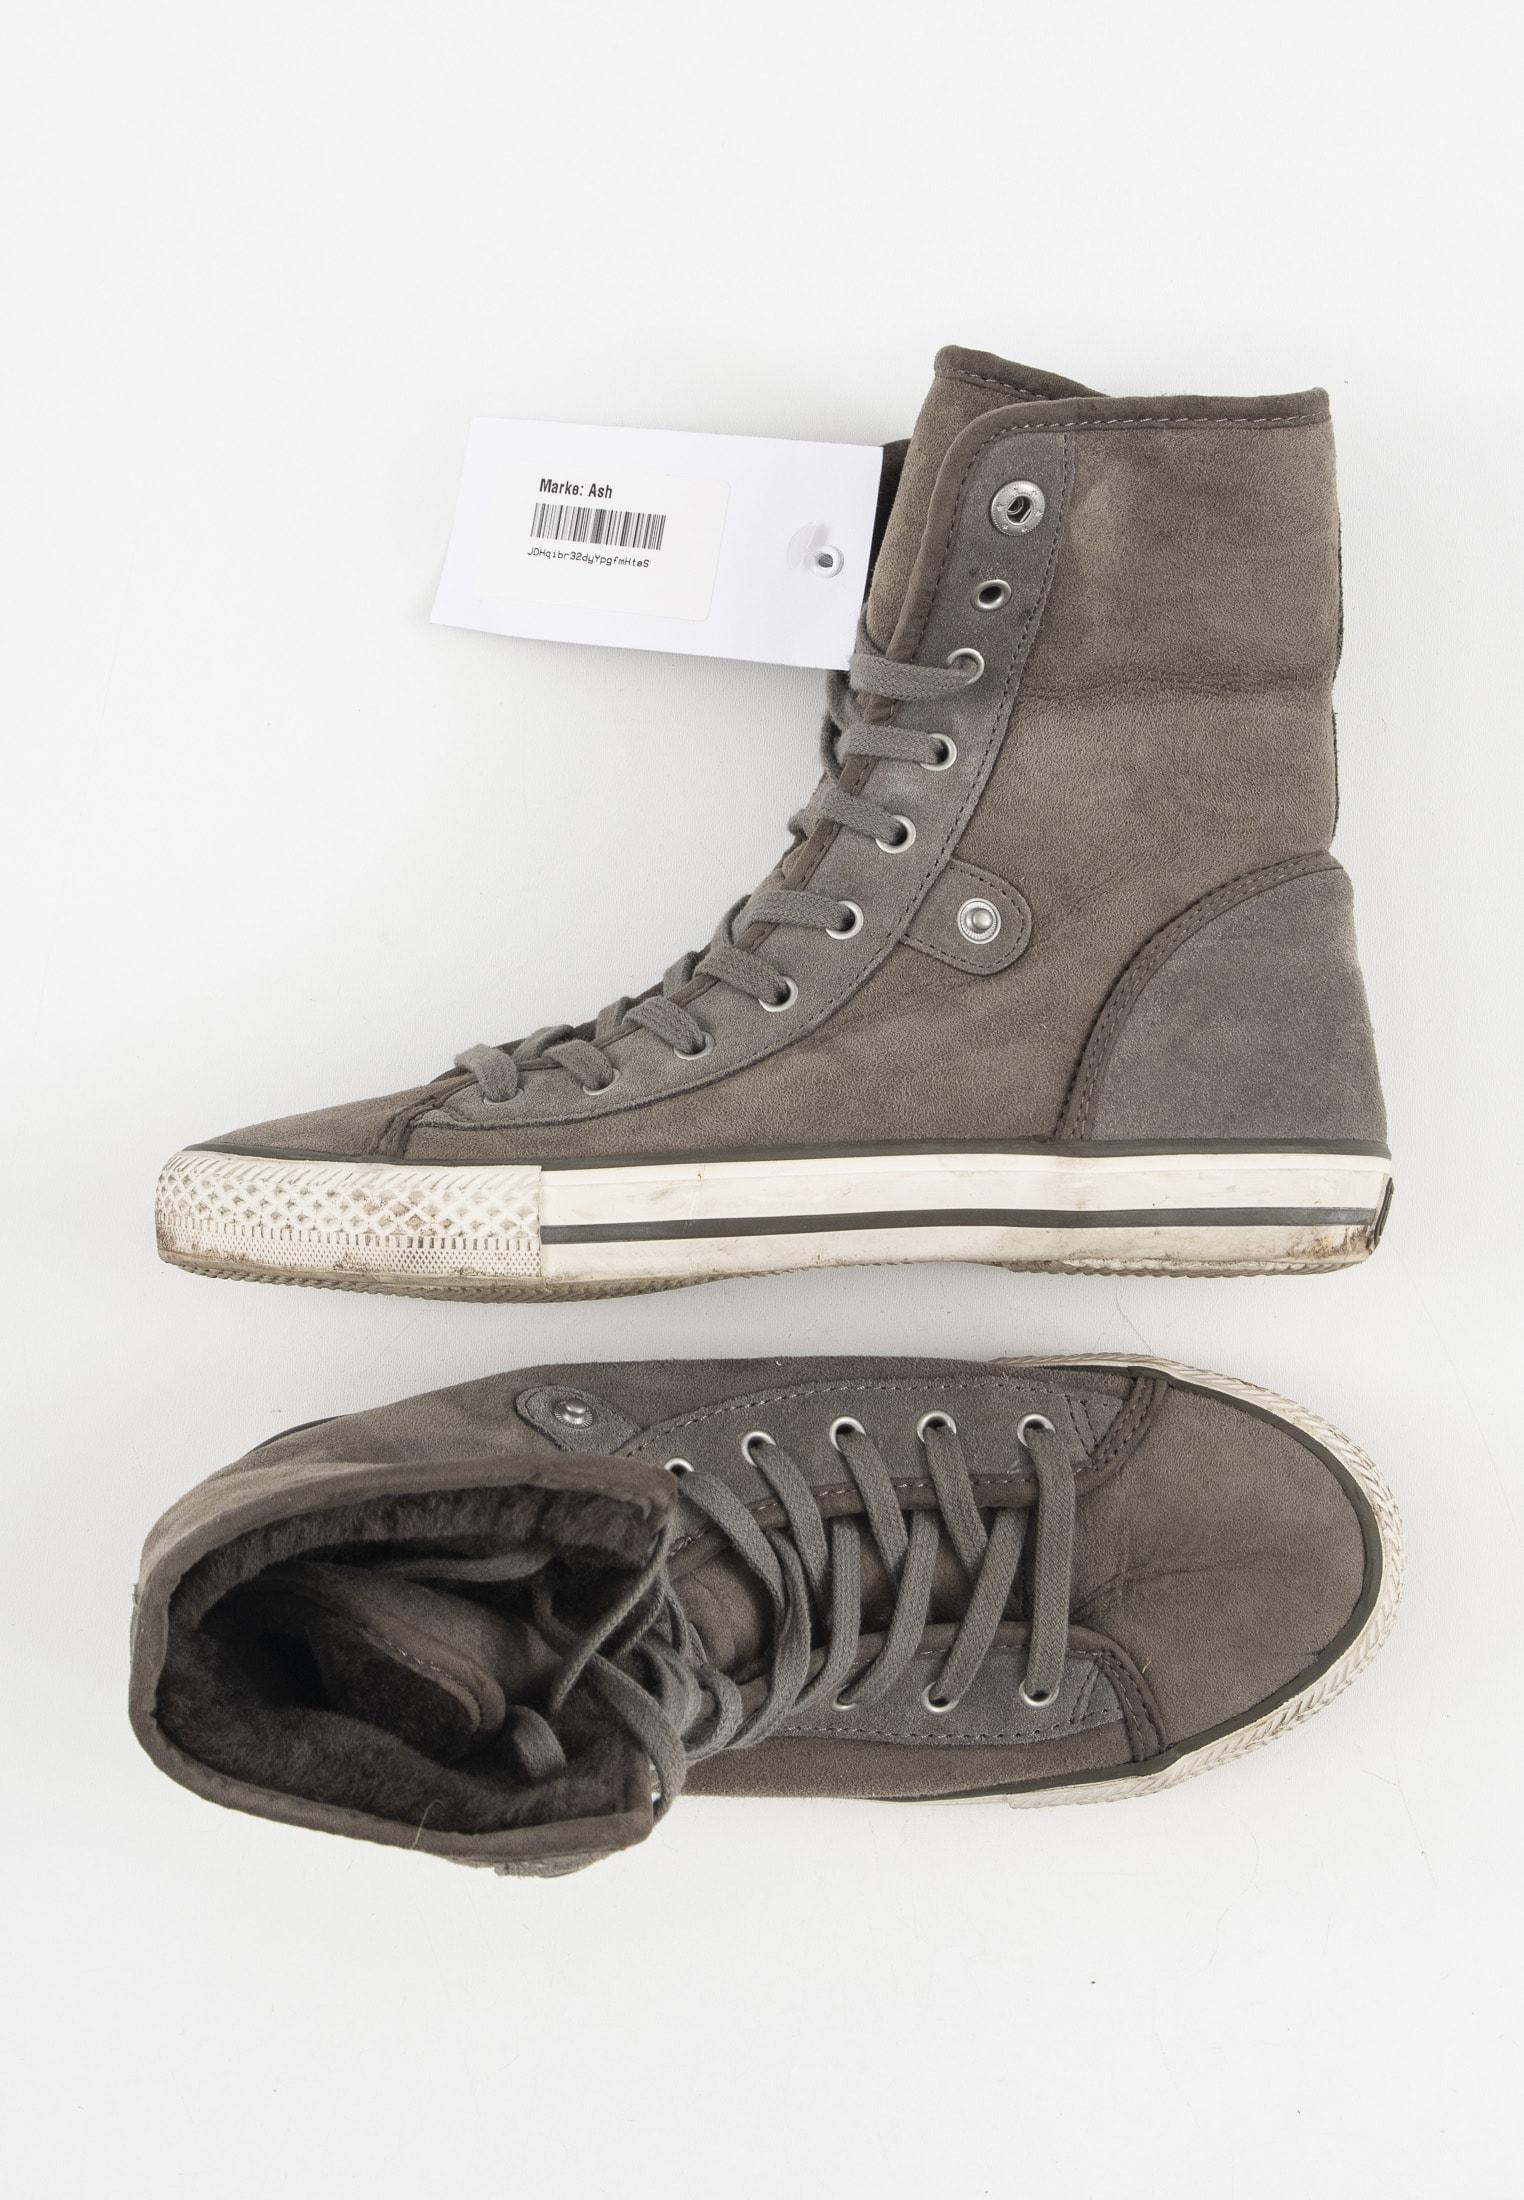 Ash Sneakers Grau Gr.41